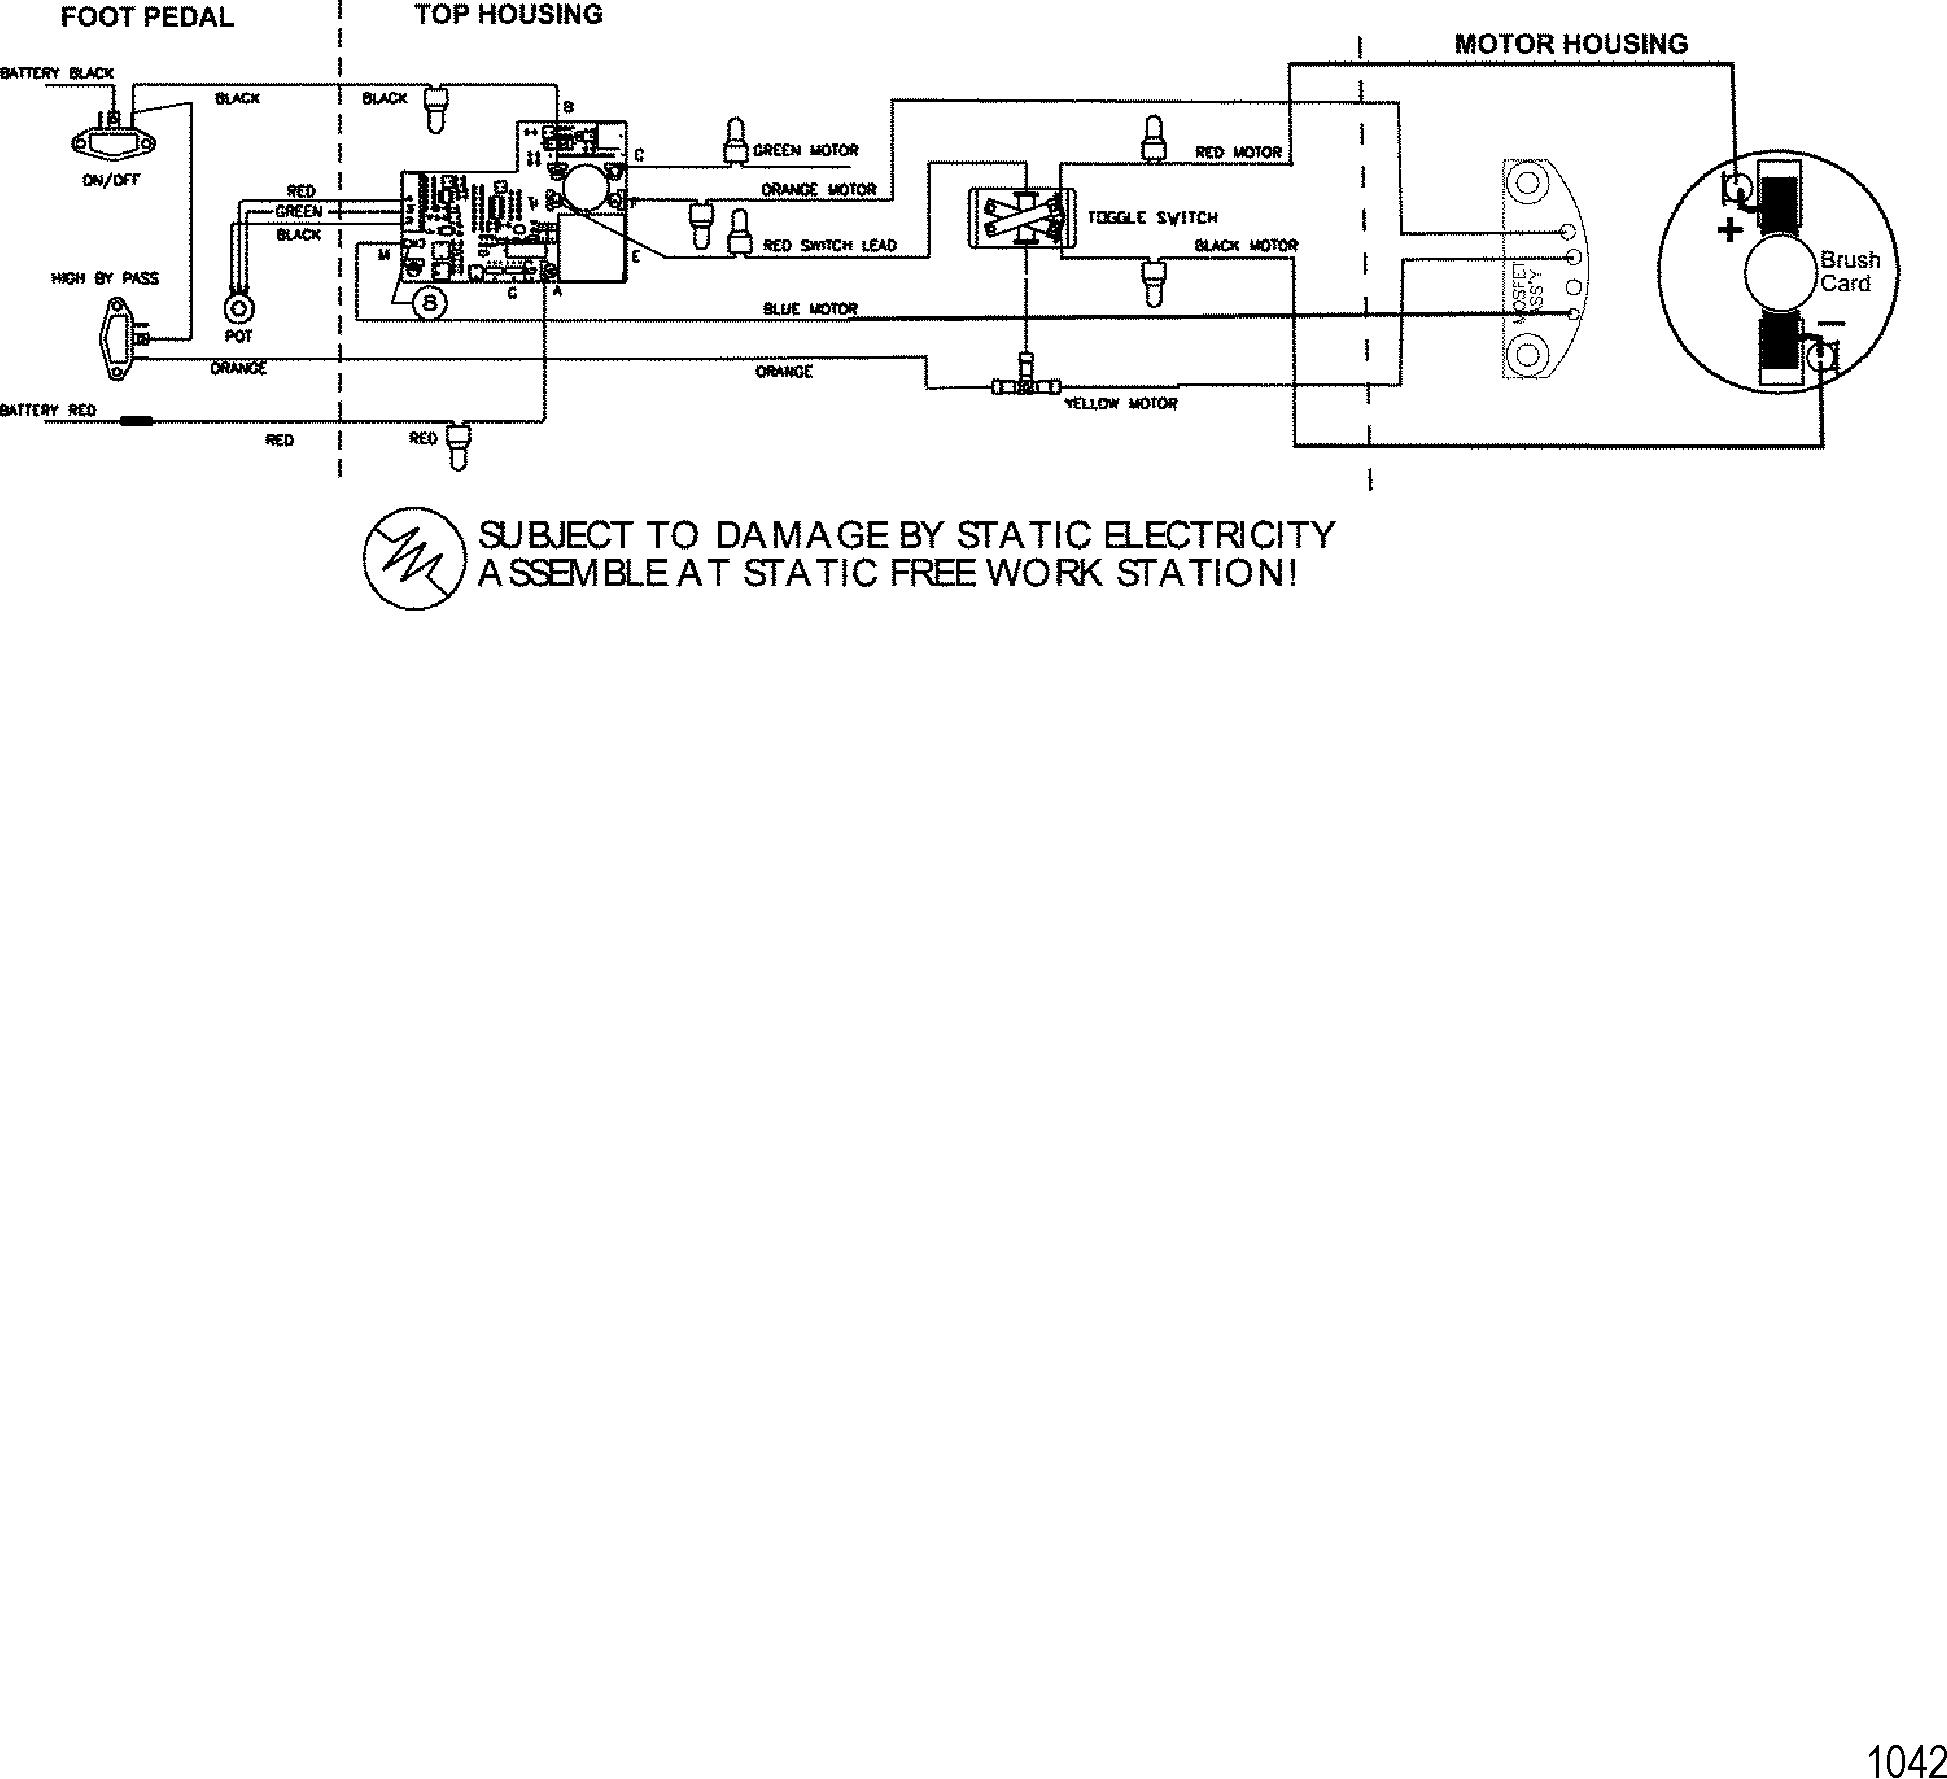 КатаРог запчастей trolling motor motorguide 600 series 1998 up wire diagram model 667v 24 volt